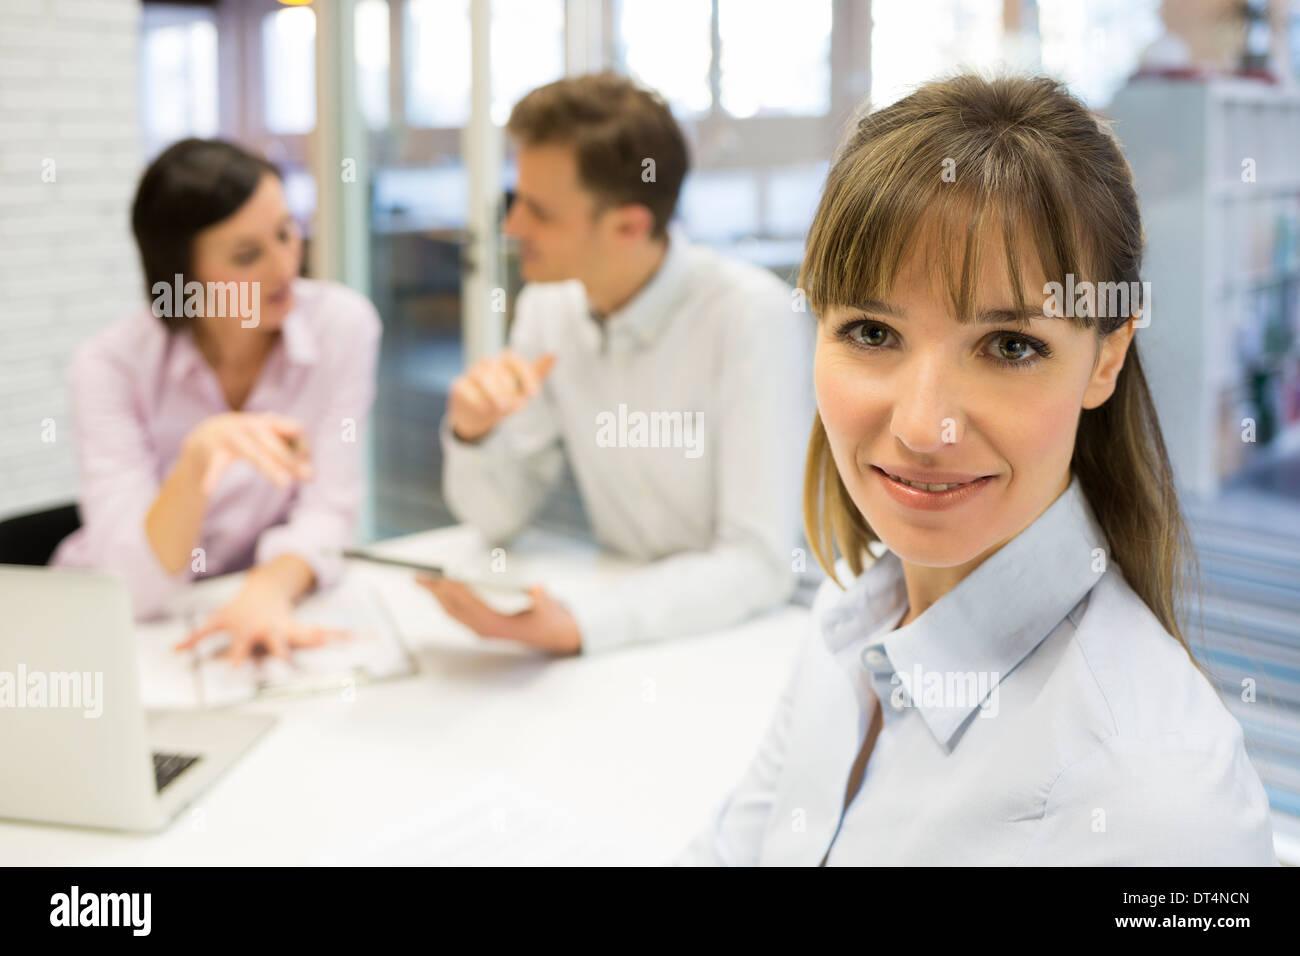 Business woman reunion office desk colleagues smil - Stock Image